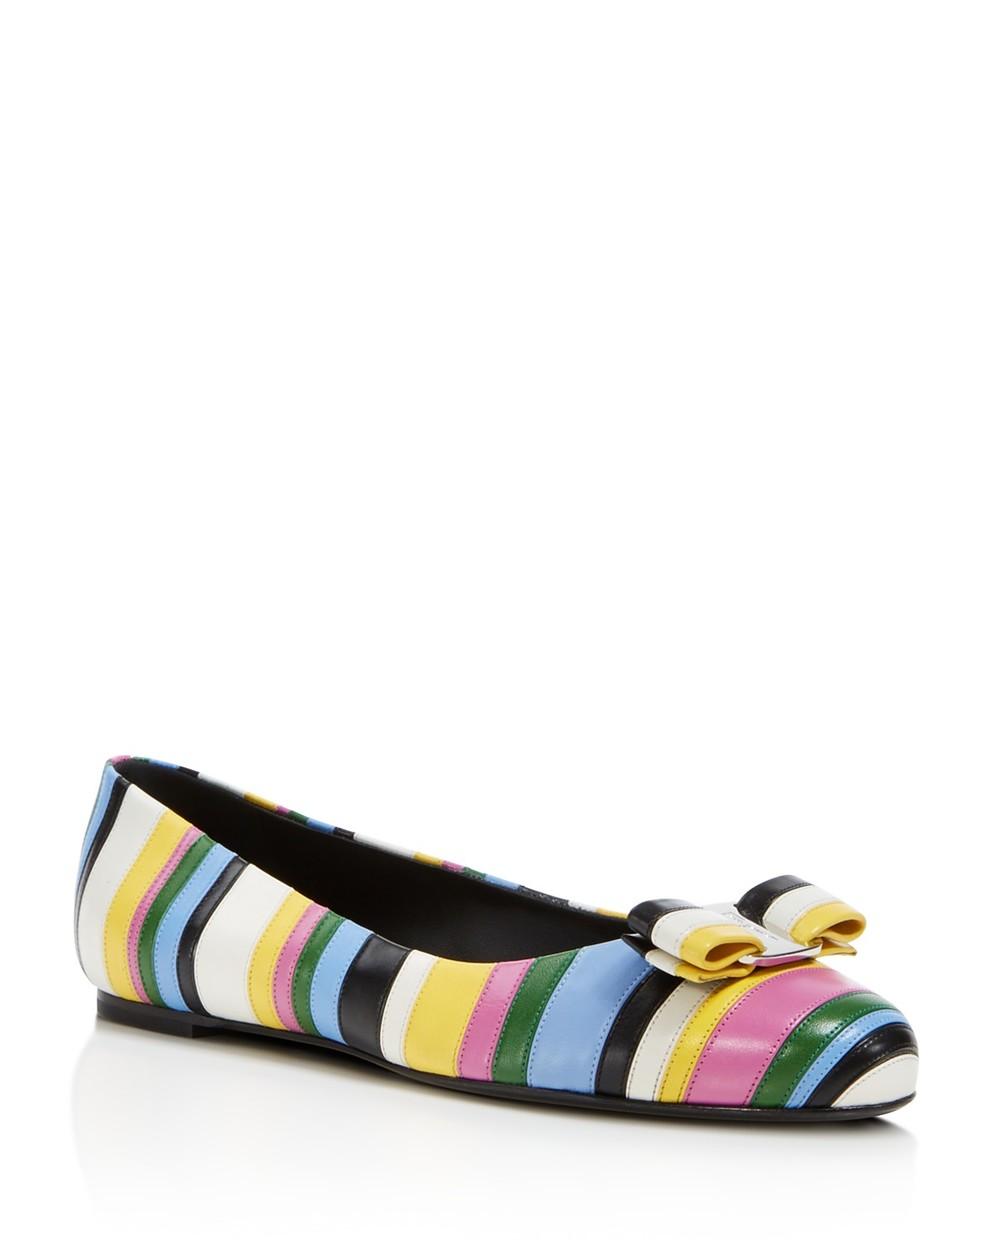 Salvatore Ferragamo Varina Stripe Bow Flats